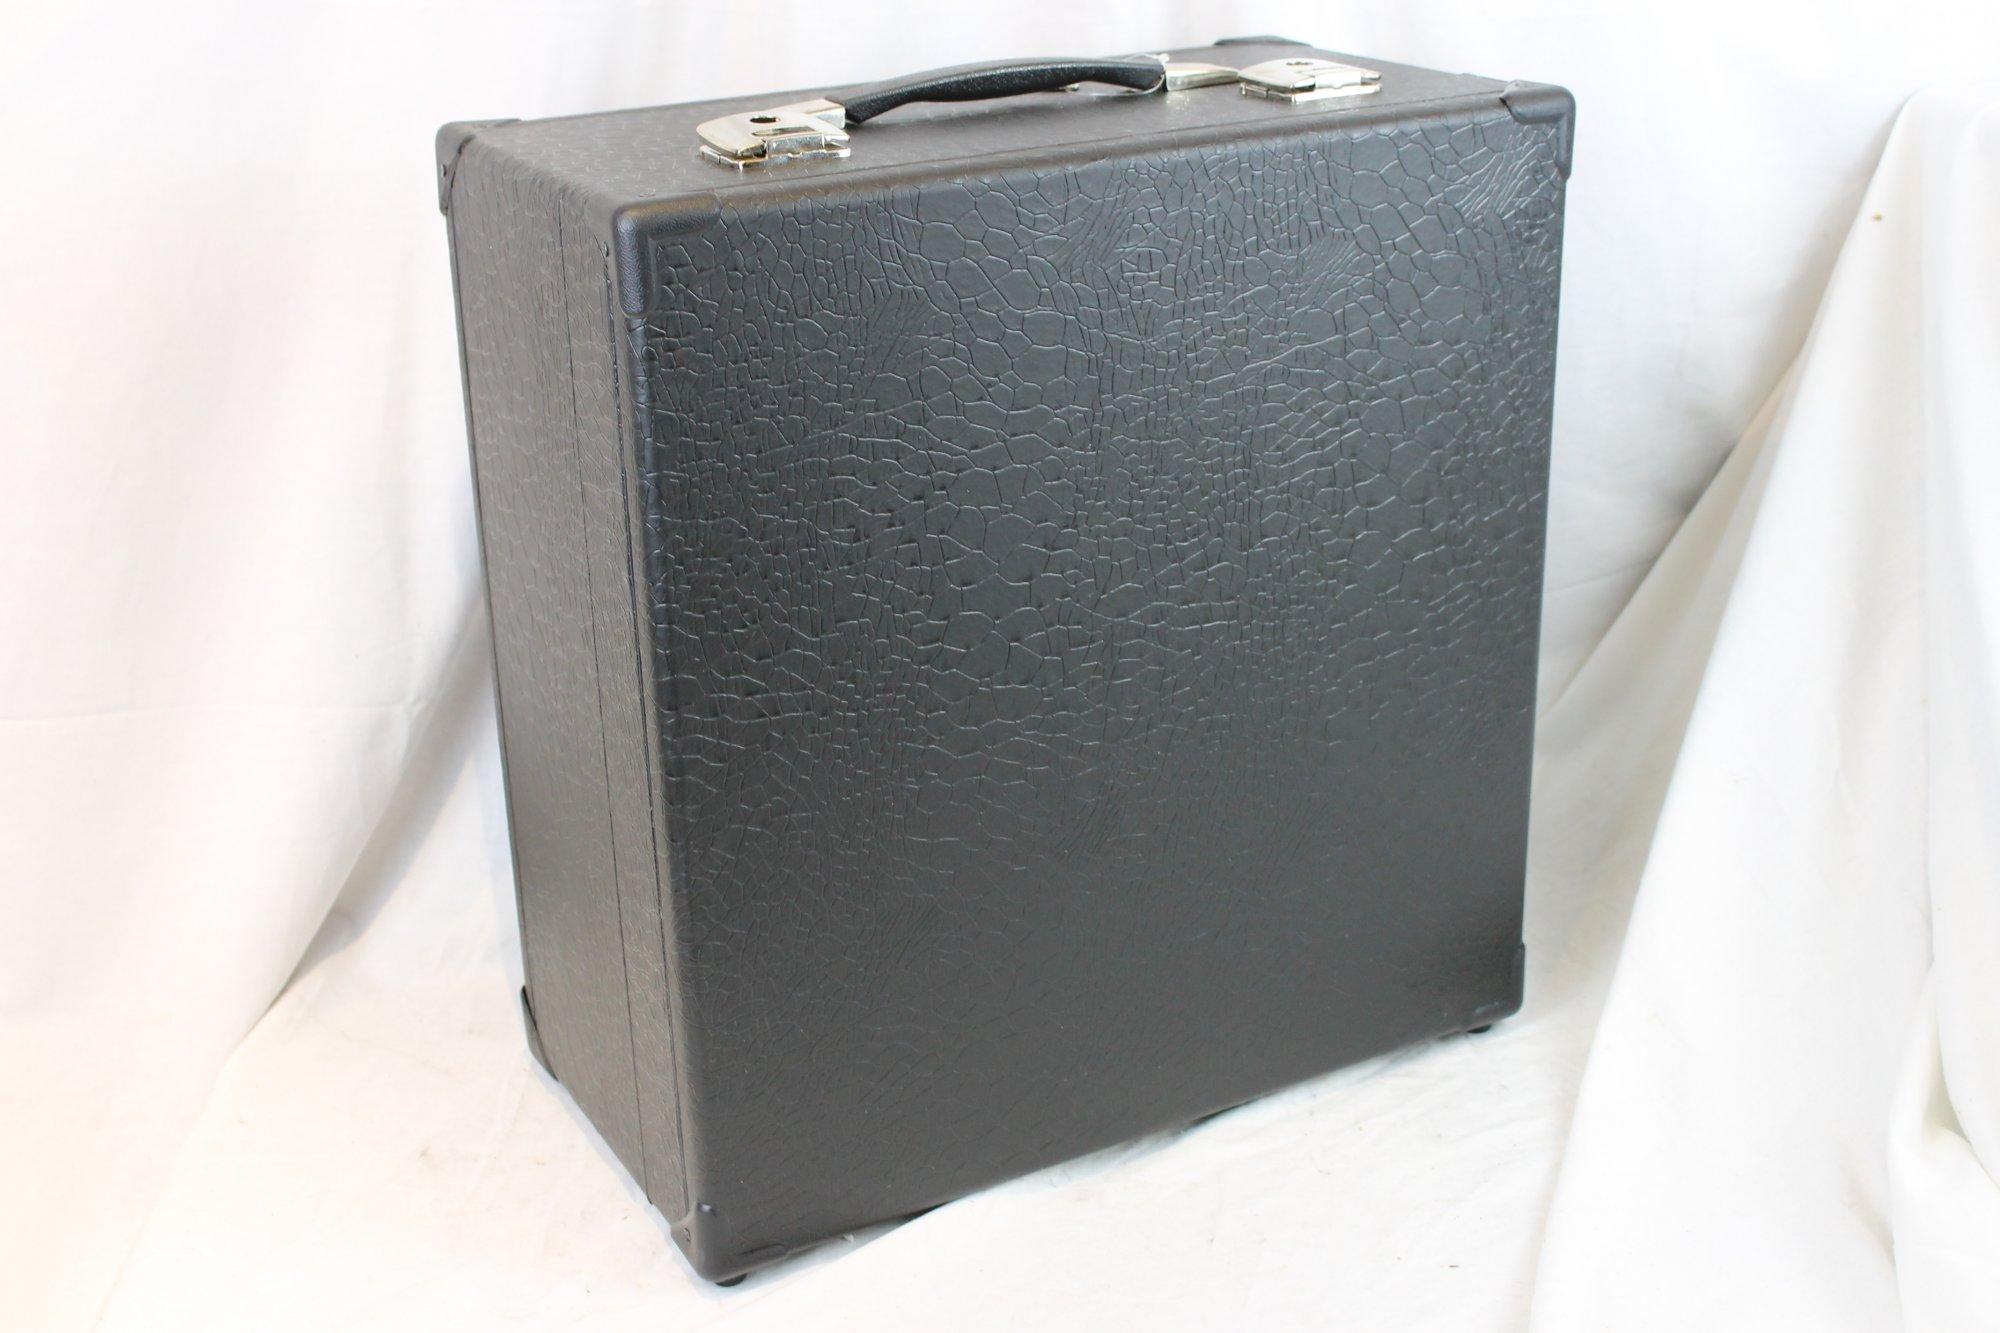 NEW Black Italian Accordion Hard Case 16.75 x 17.5 x 8.5 (42.5cm x 44.5cm x 21.5cm) Fits Roland FR-1X